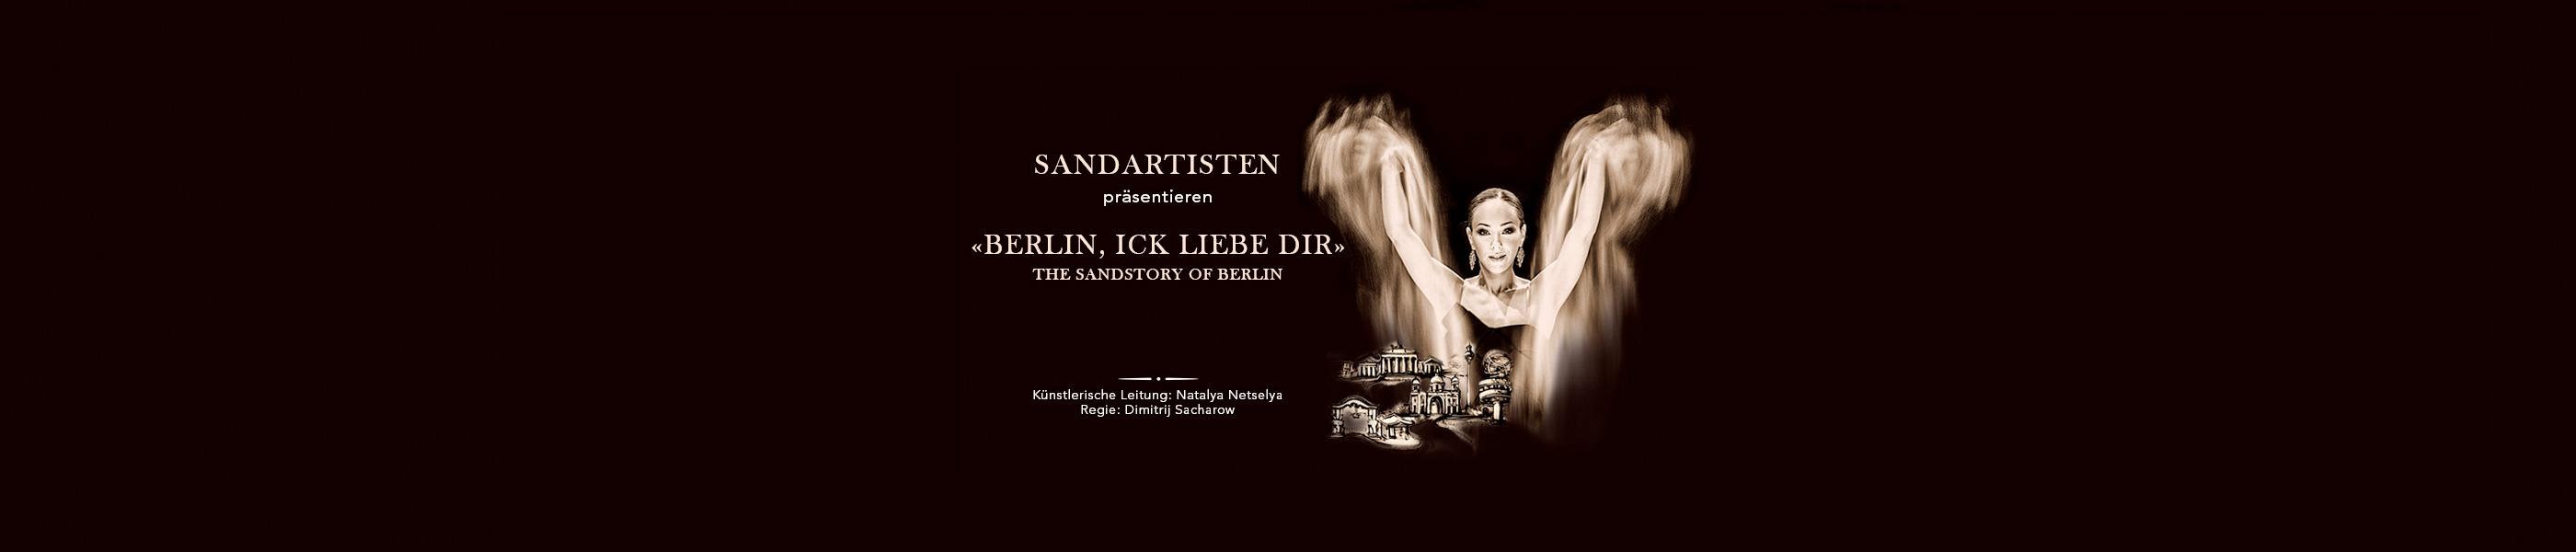 Sandtheater-Berlin-Admiralspalast